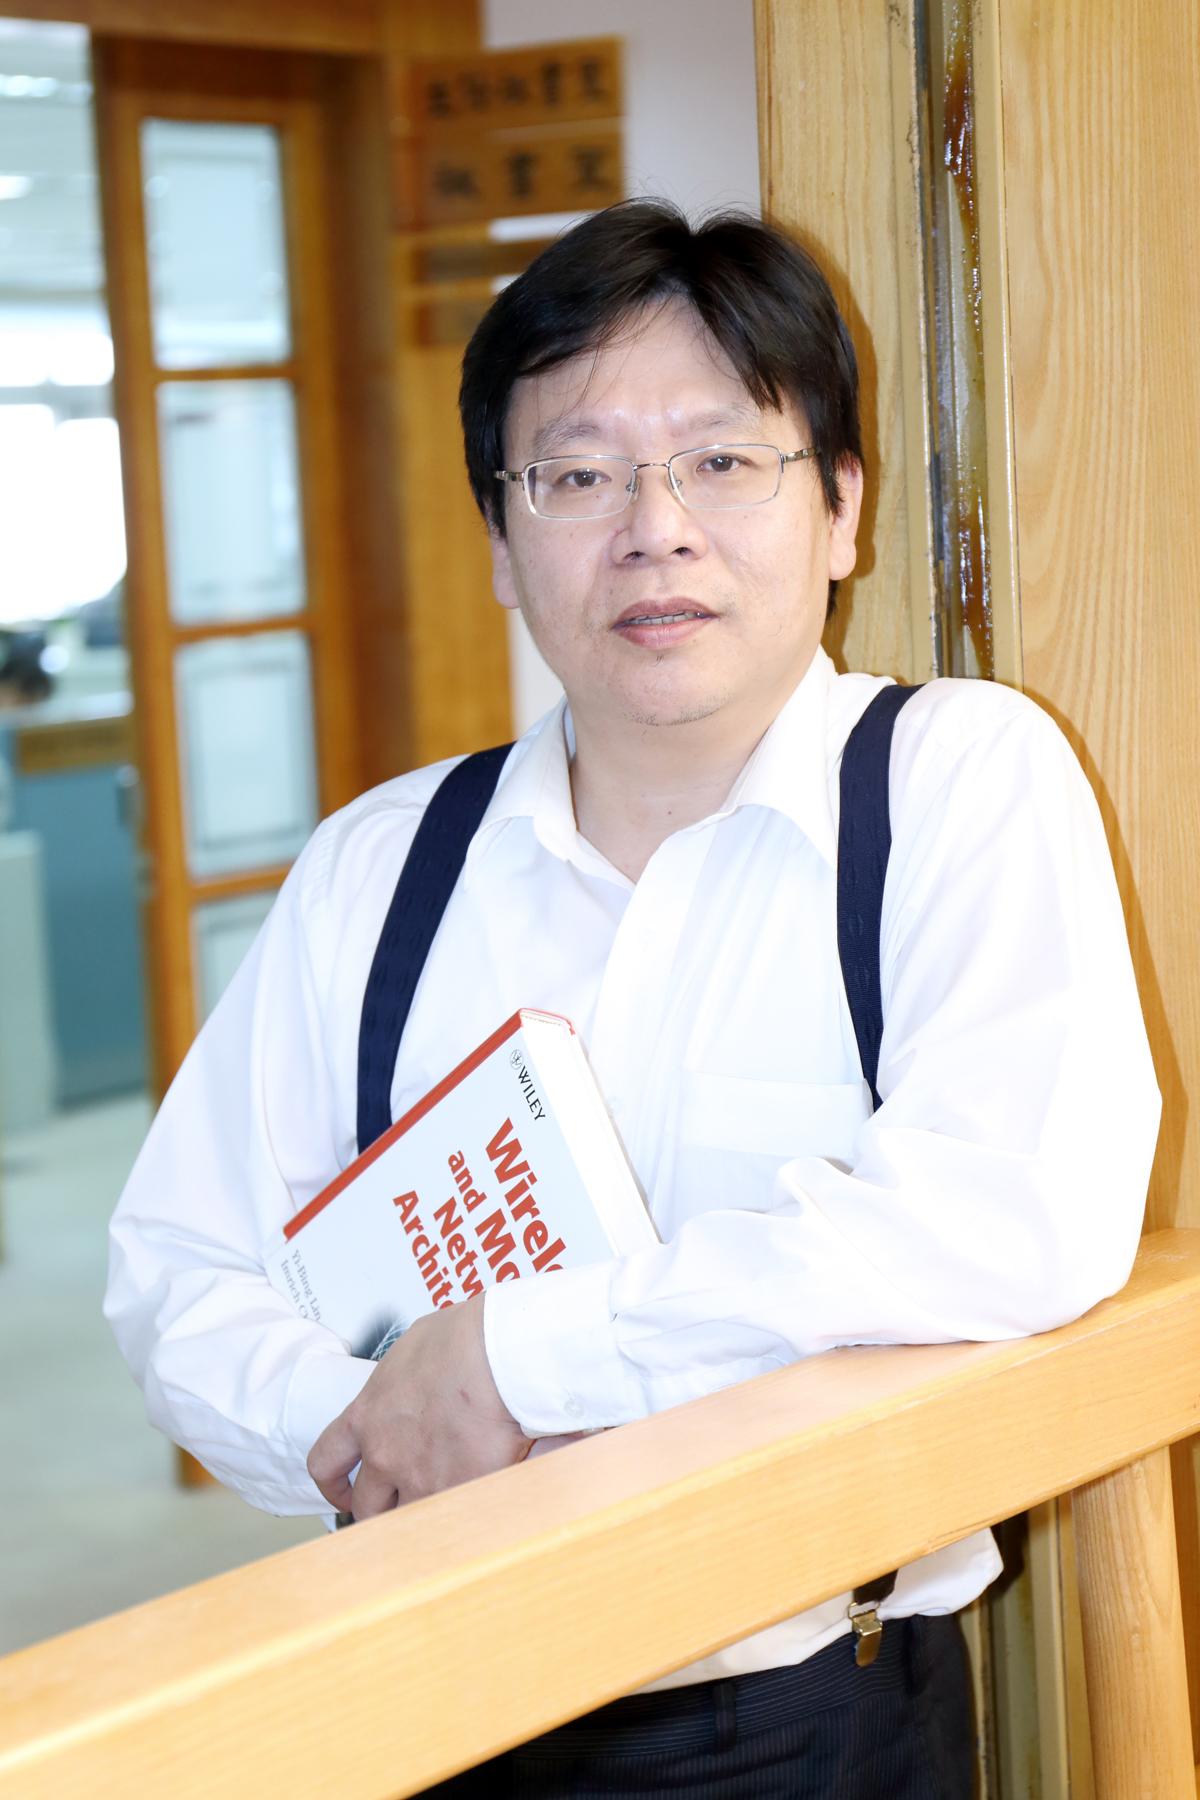 Jason Yi-Bing Lin